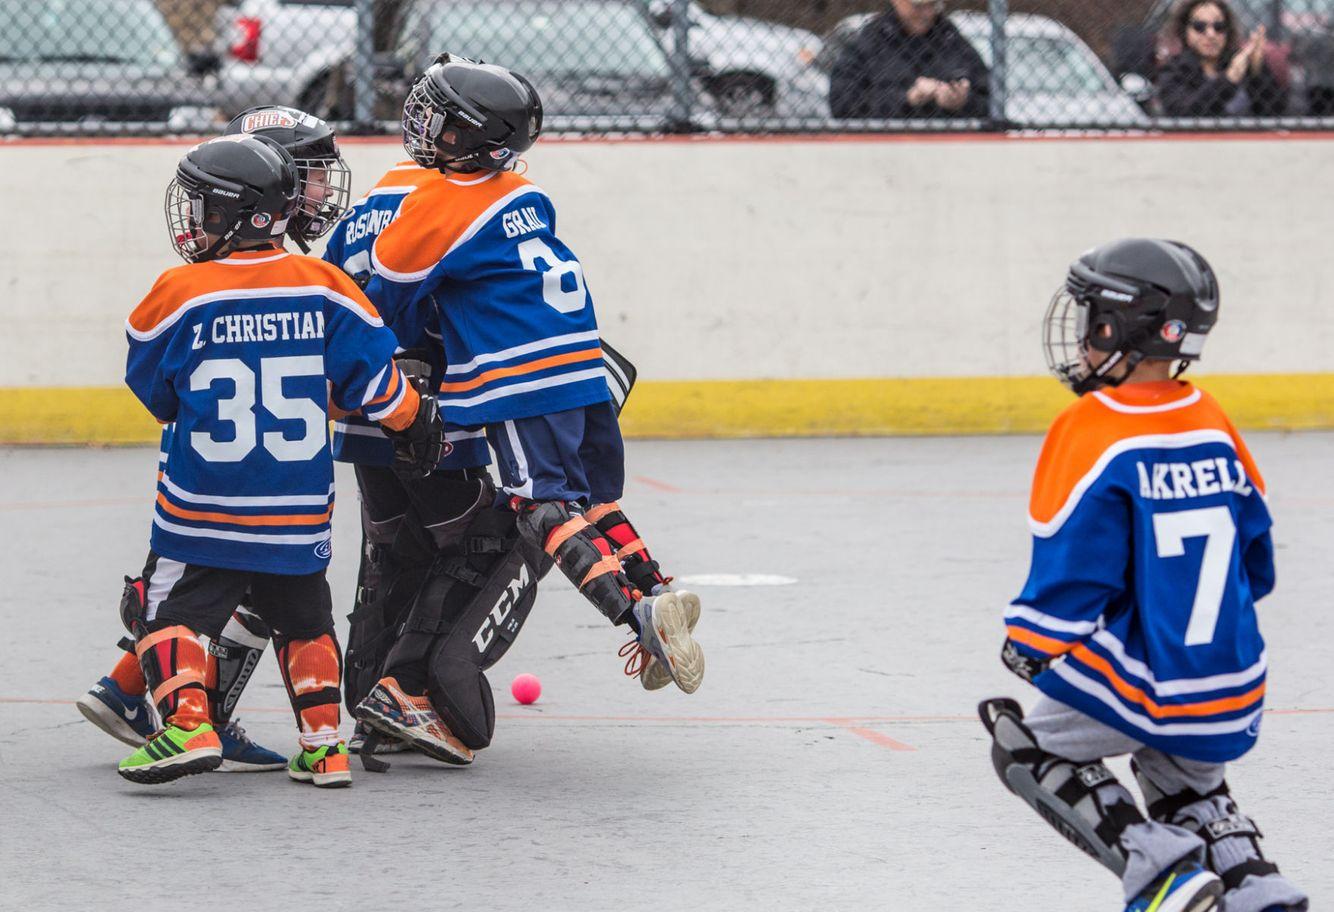 1r2016_02hockey_164.jpg